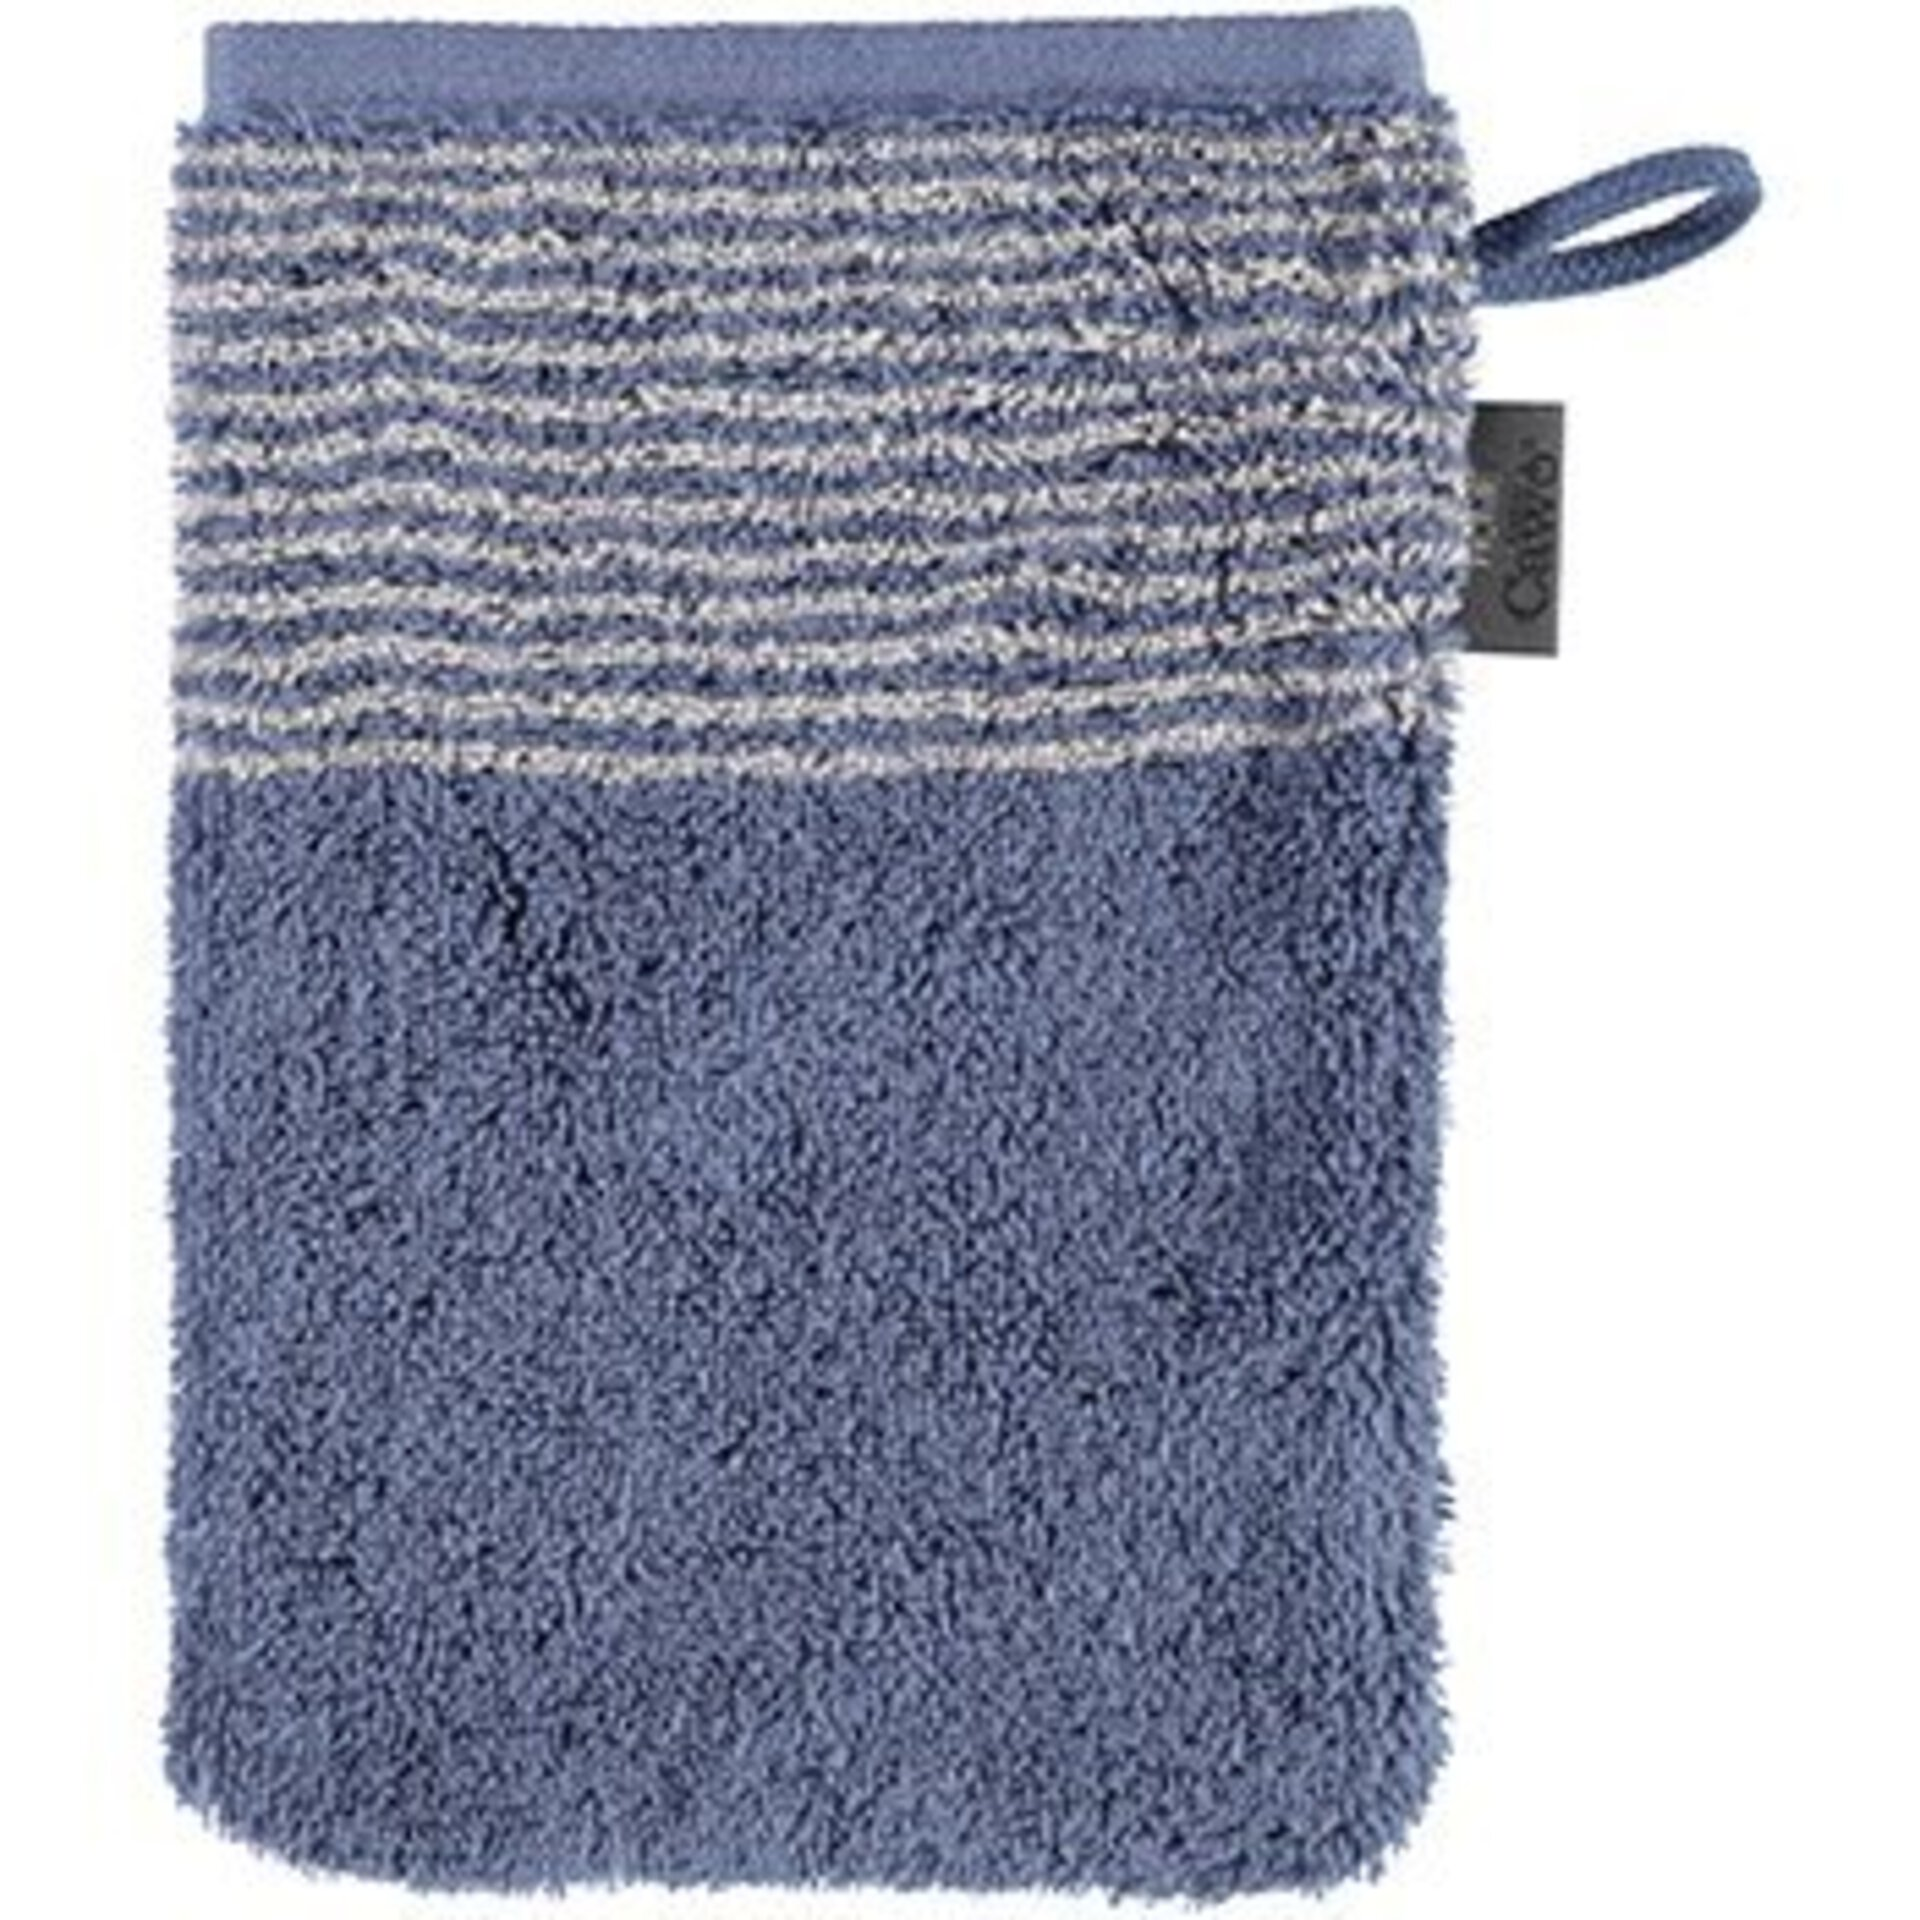 Waschhandschuh Two-Tone Cawö Textil 16 x 22 cm